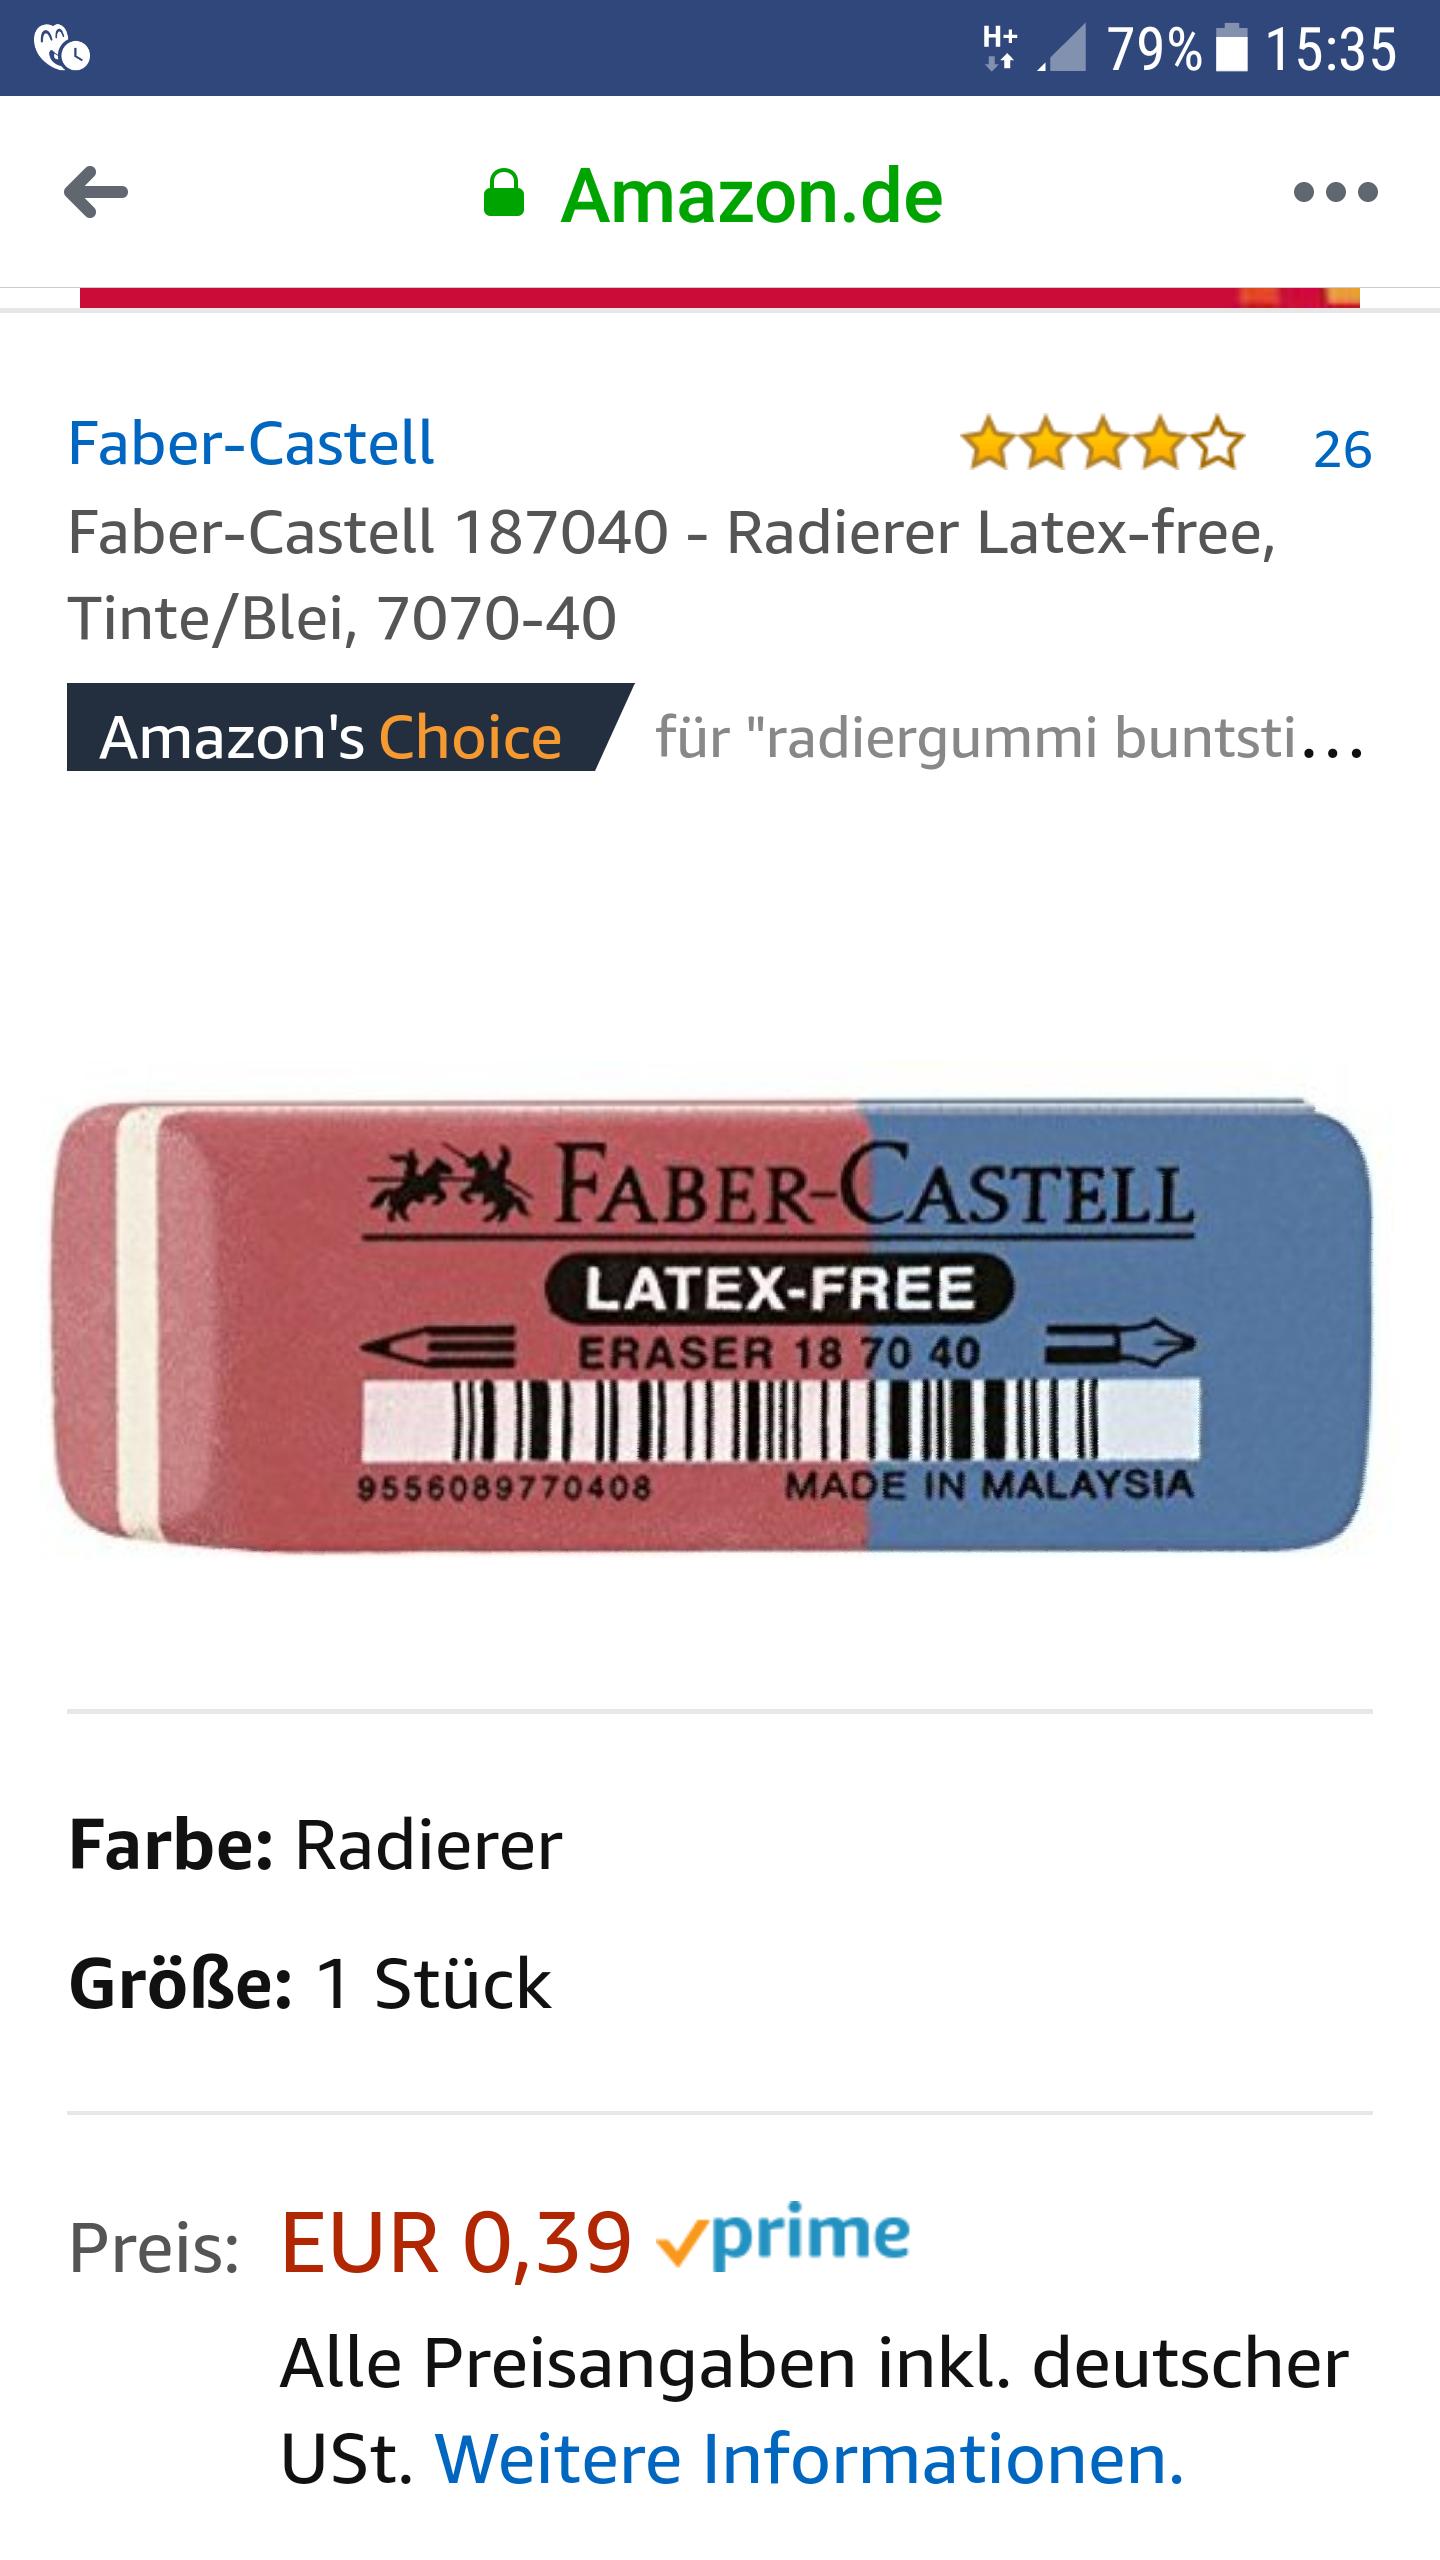 (Amazon)Faber-Castell 187040 - Radierer Latex-free 0,39€mit Prime